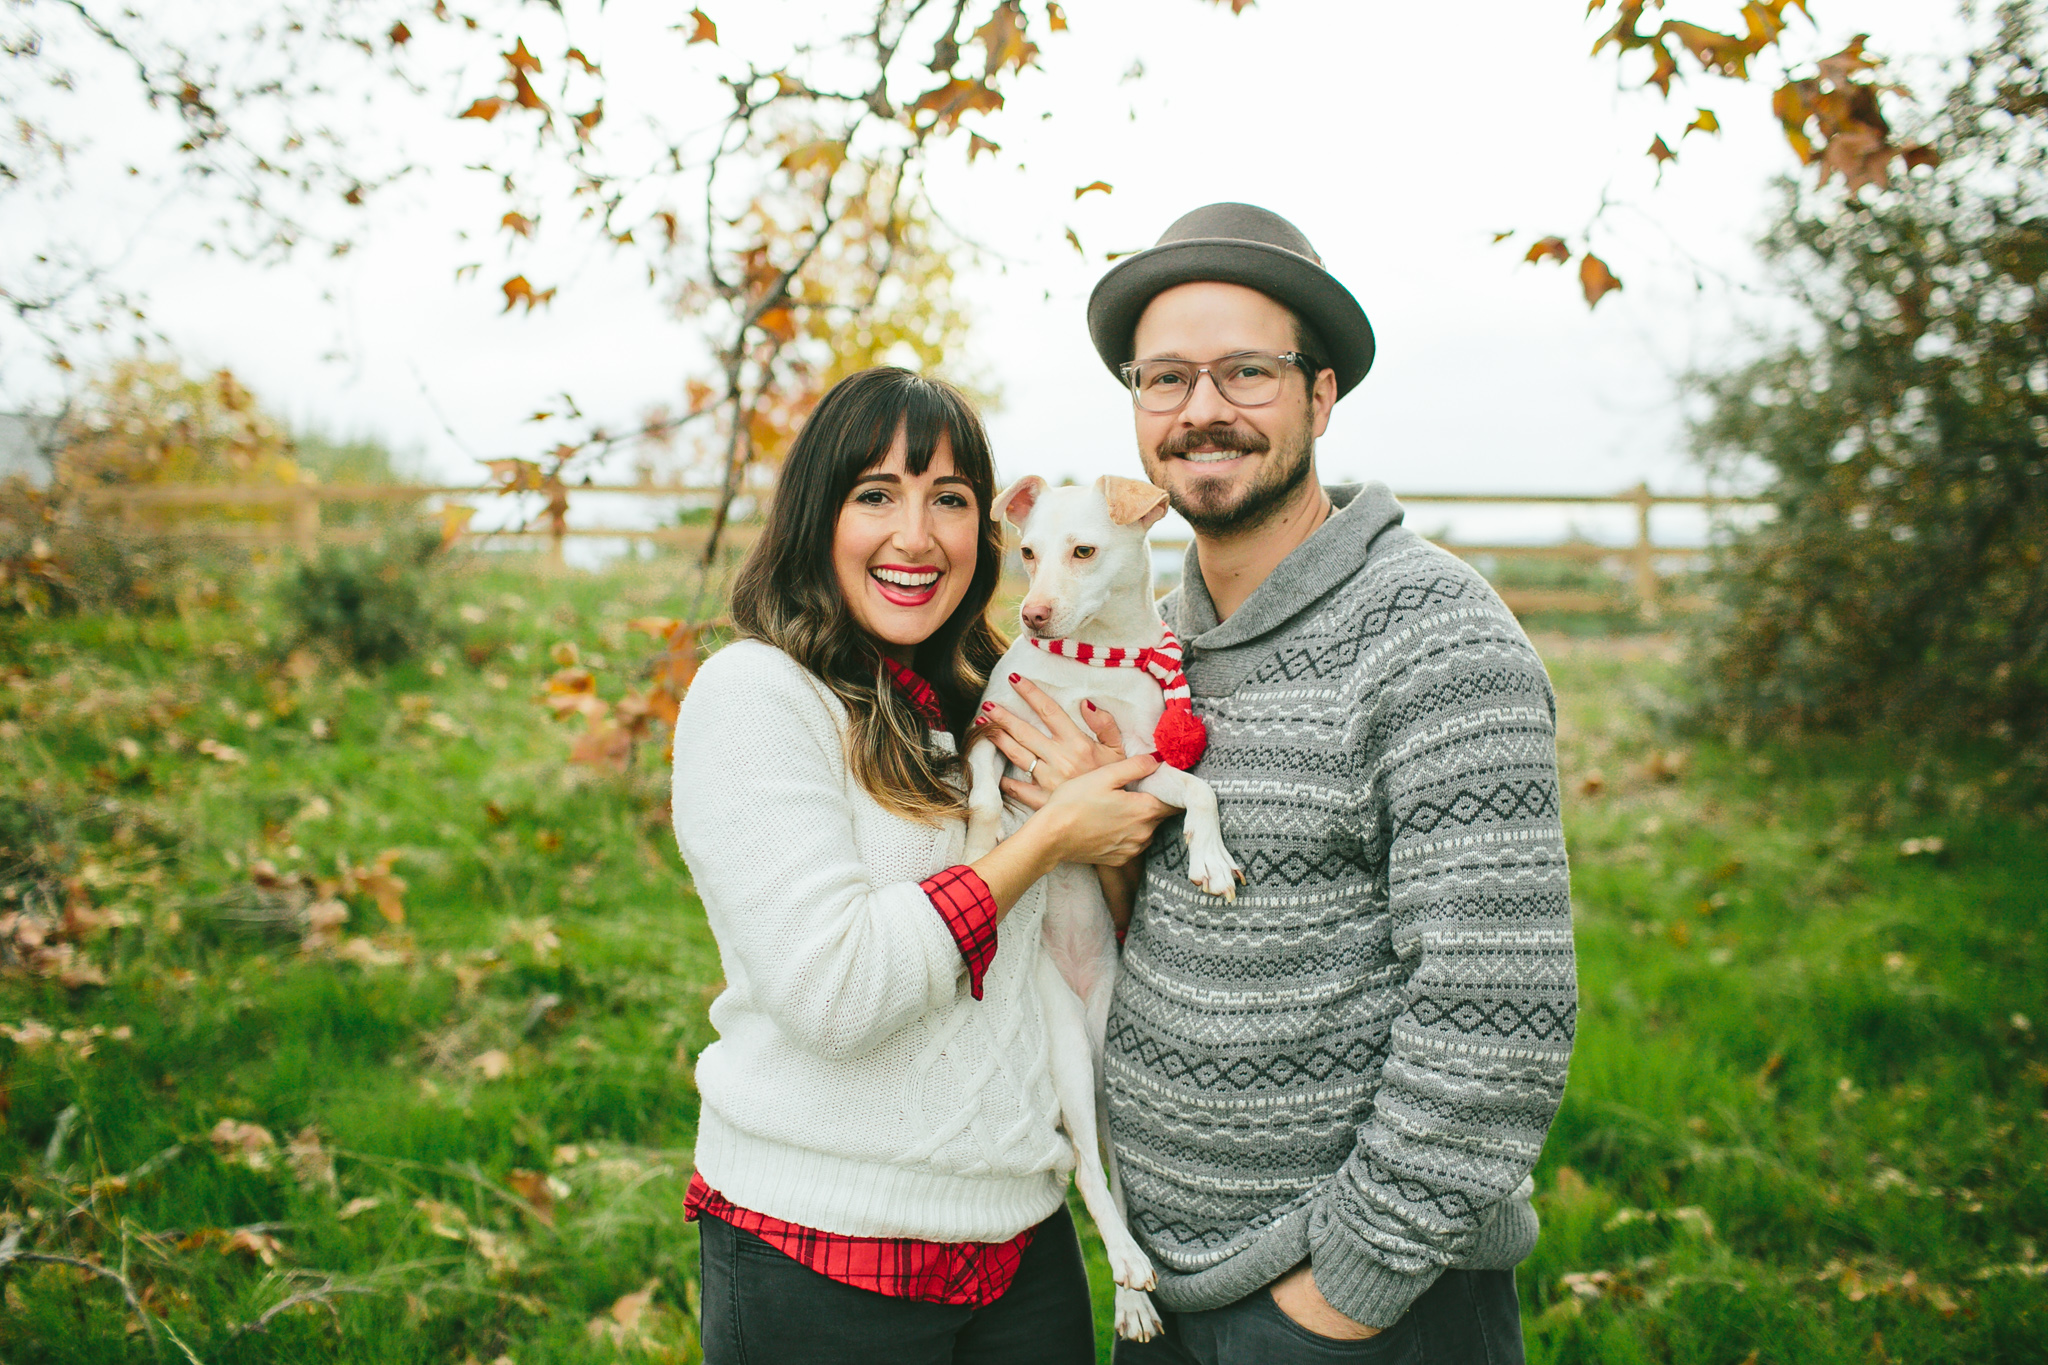 Christmas-Photos_2015-KellyBoitanoPhotography_WEB20151215_0154